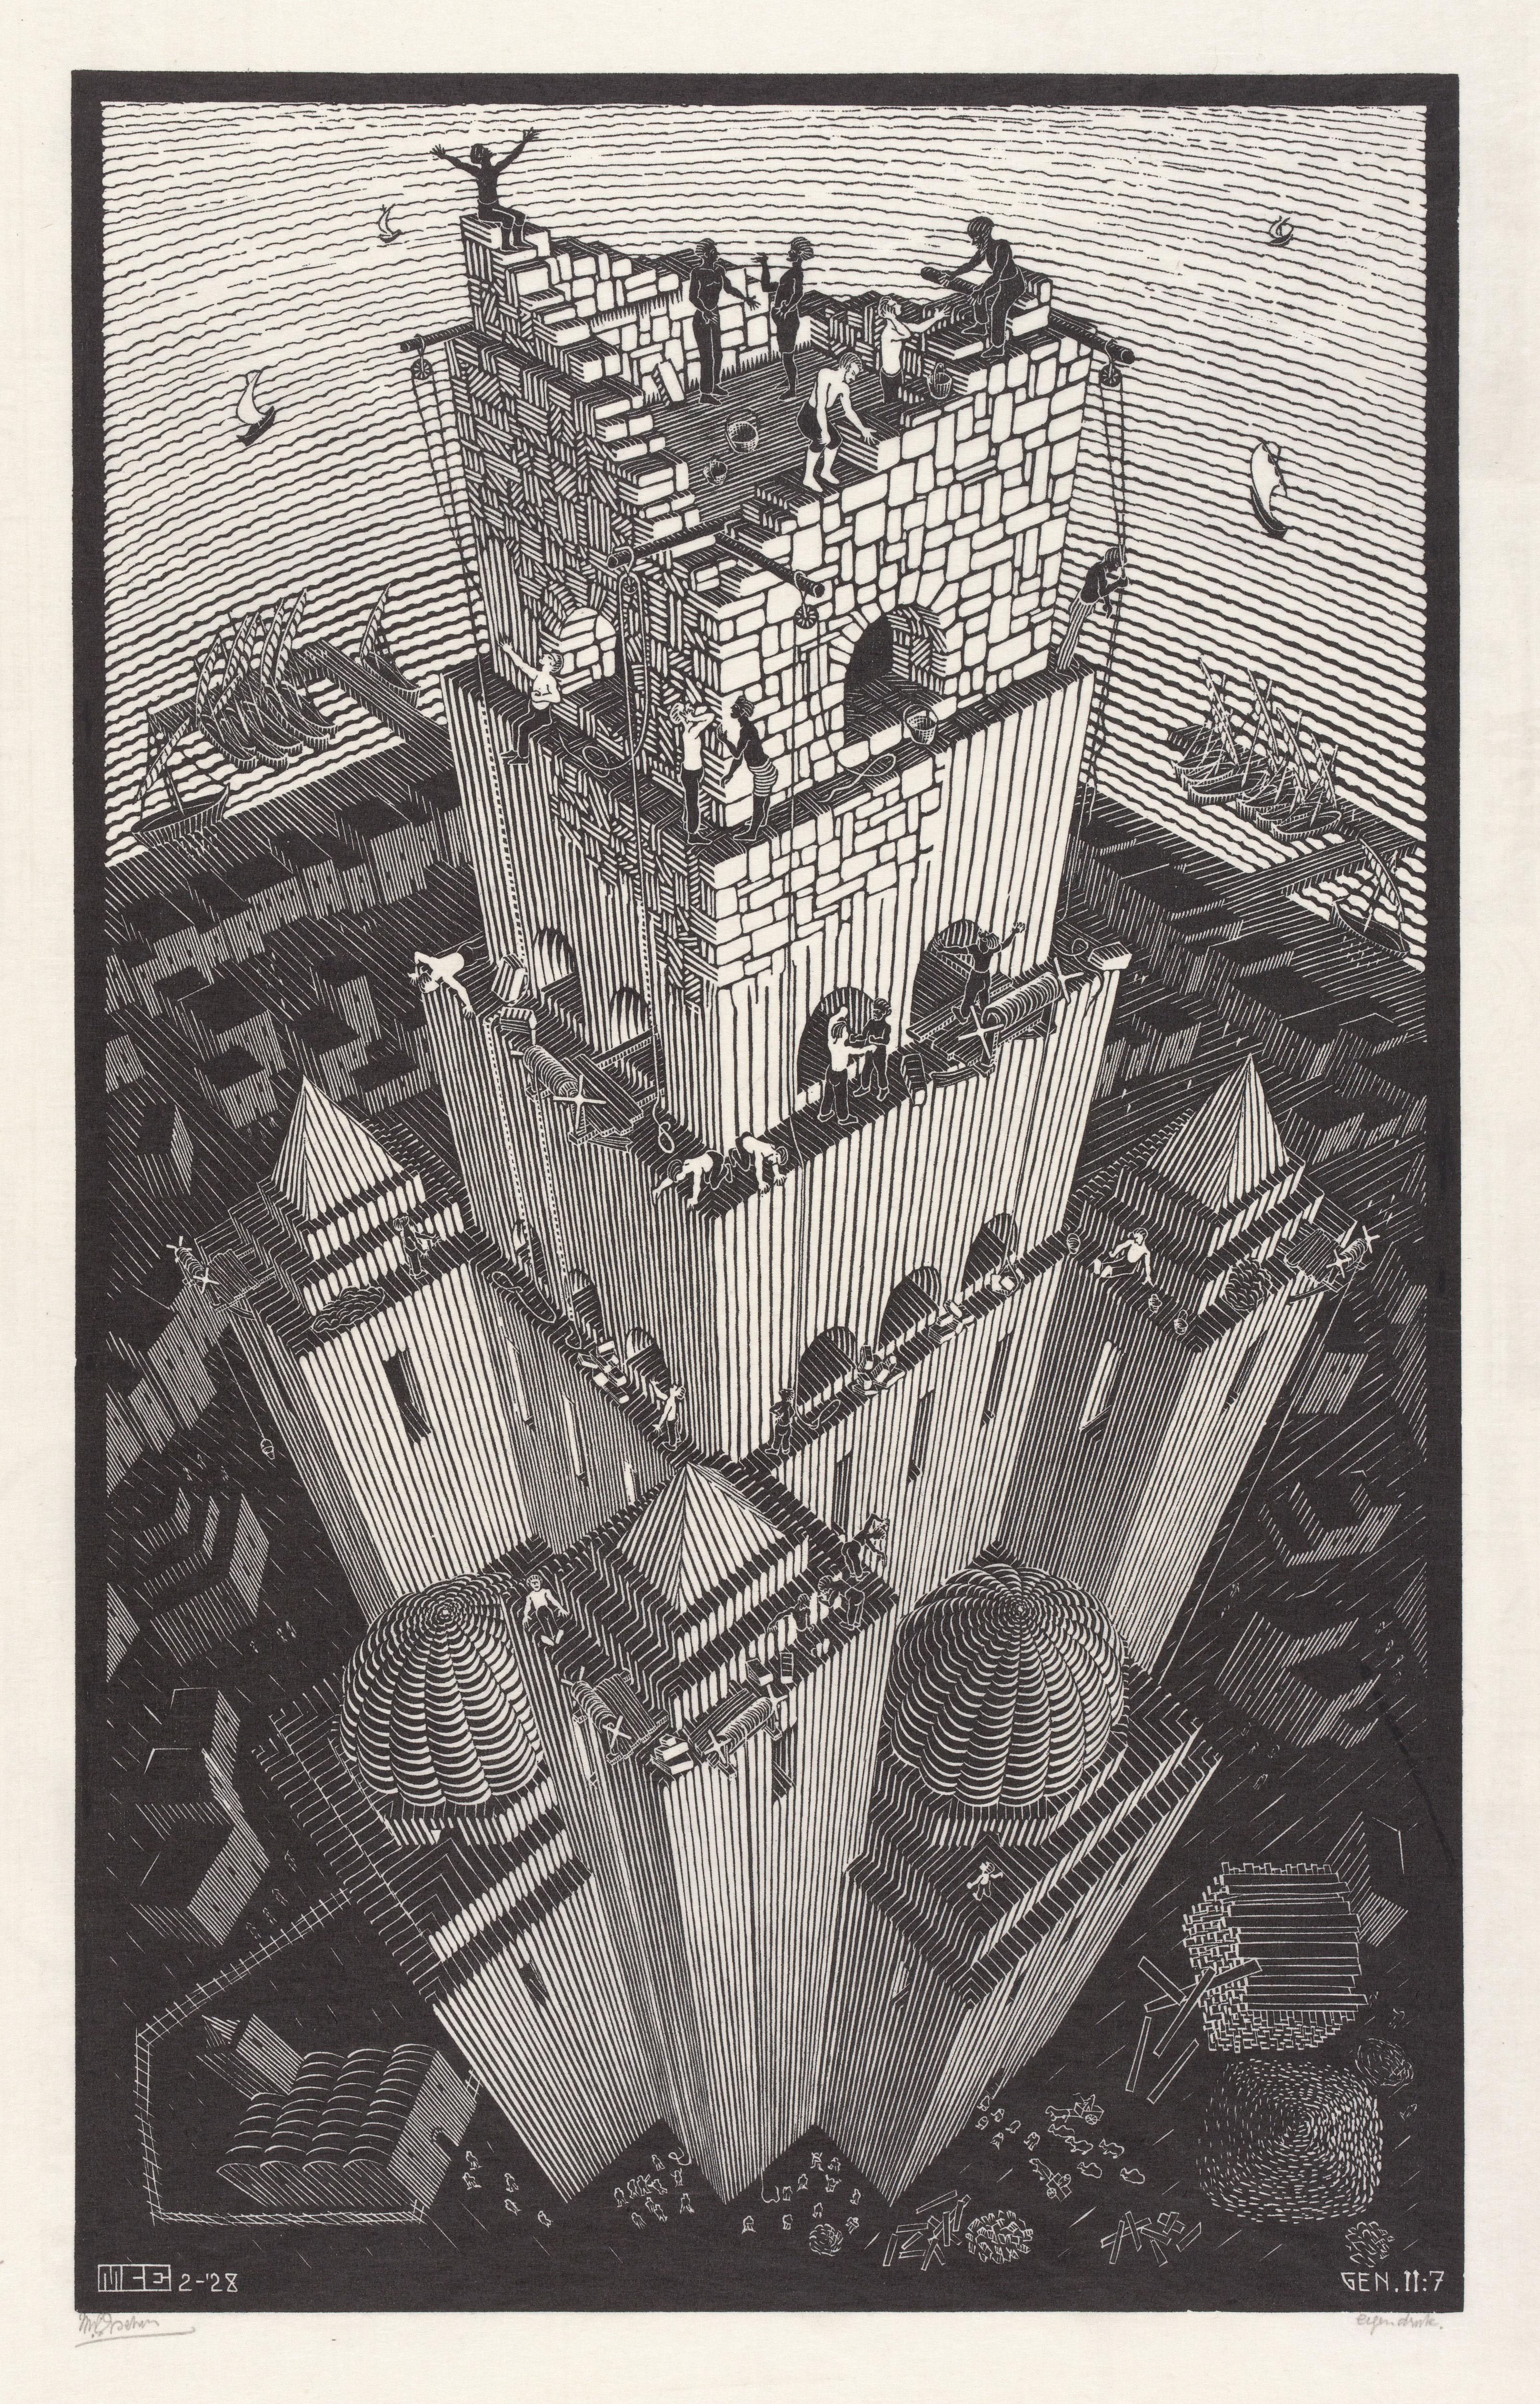 M. C. Escher Tower of Babel February 1928 woodcut Escher Collection, Gemeentemuseum Den Haag, The Hague, the Netherlands © The M. C. Escher Company, the Netherlands. All rights reserved